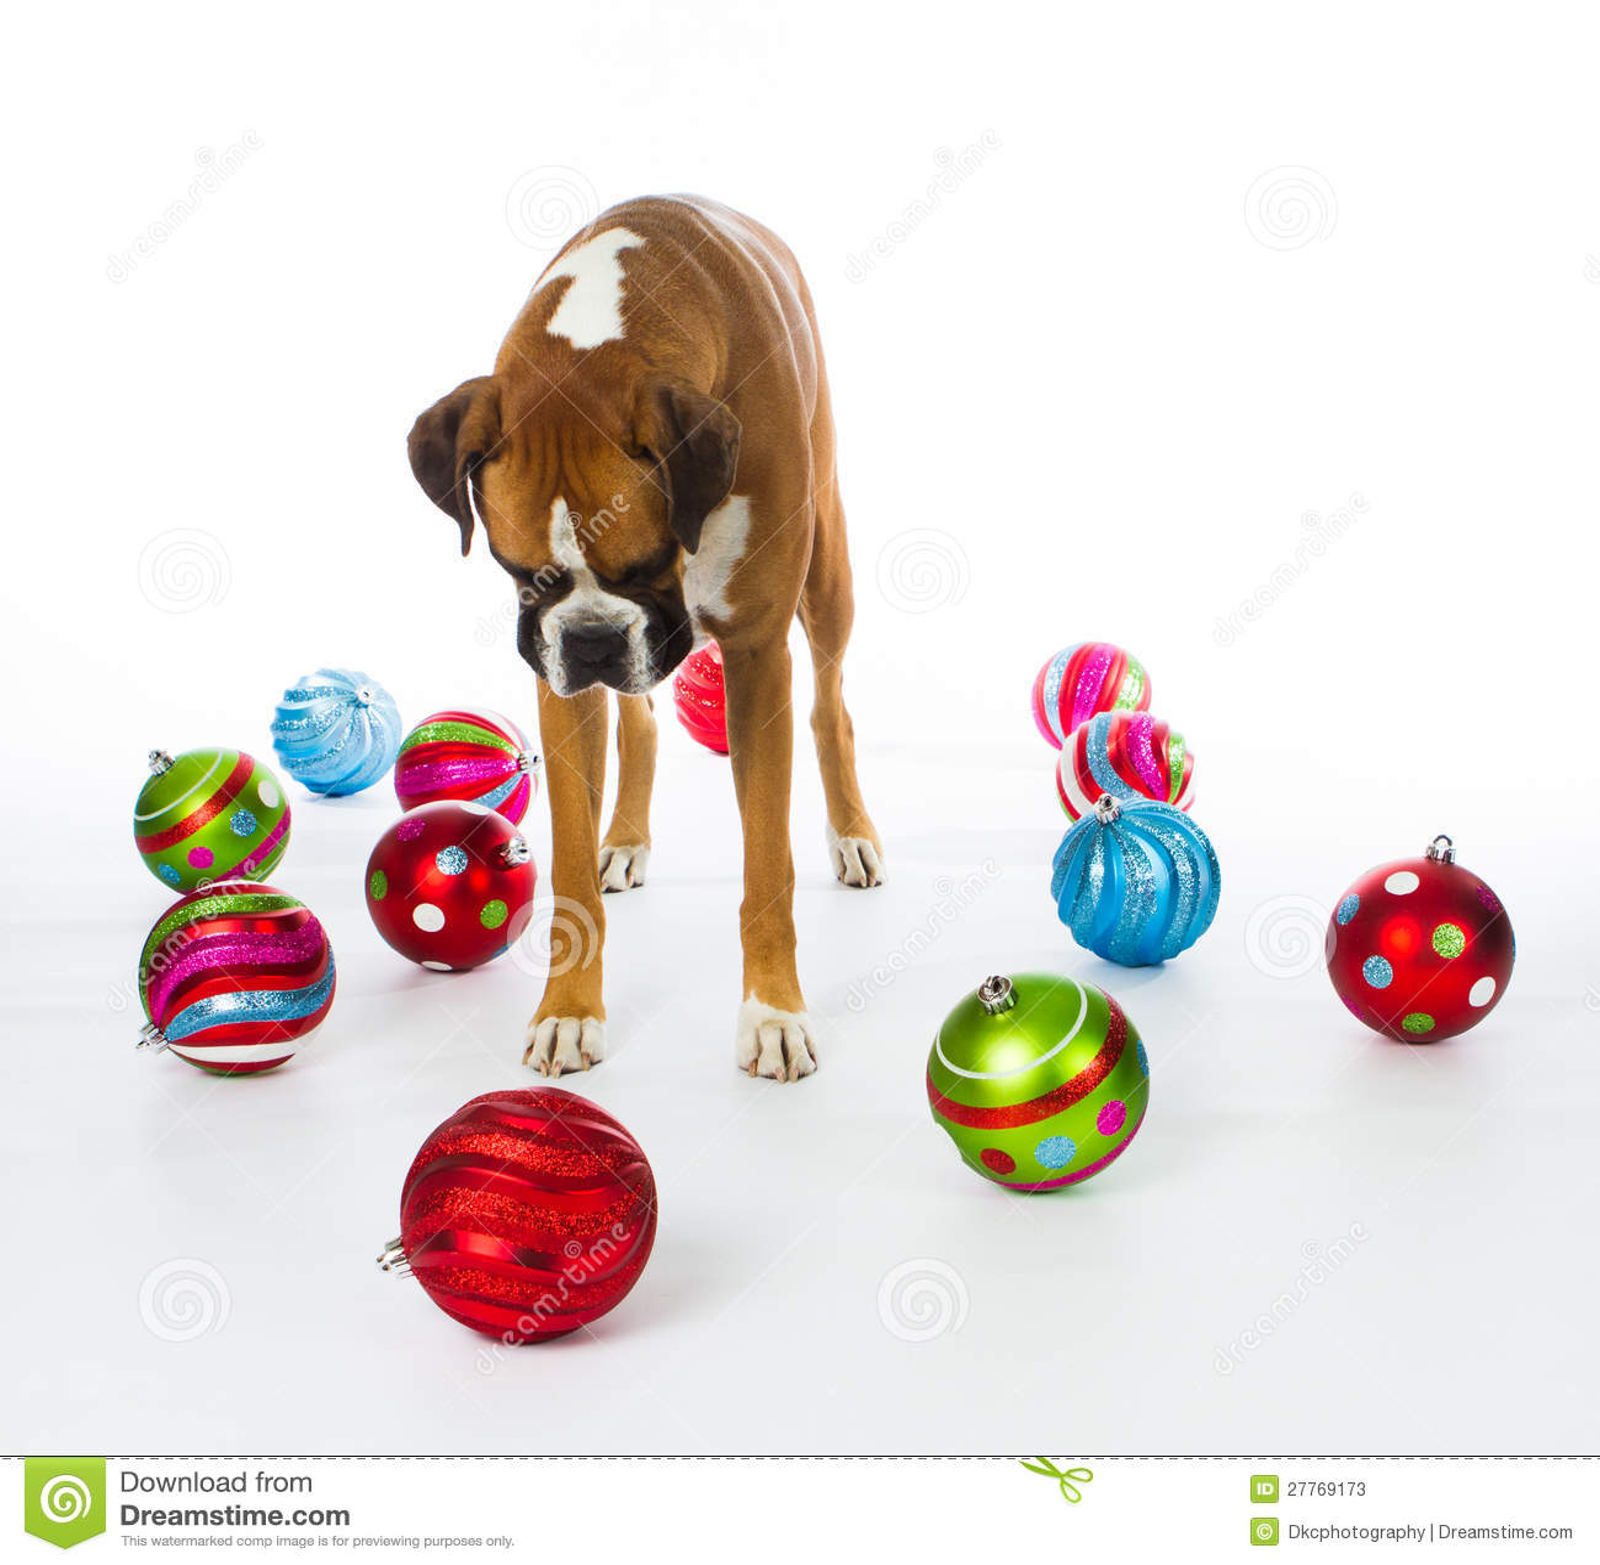 Dog christmas ornaments - Boxer Dog With Christmas Ornaments